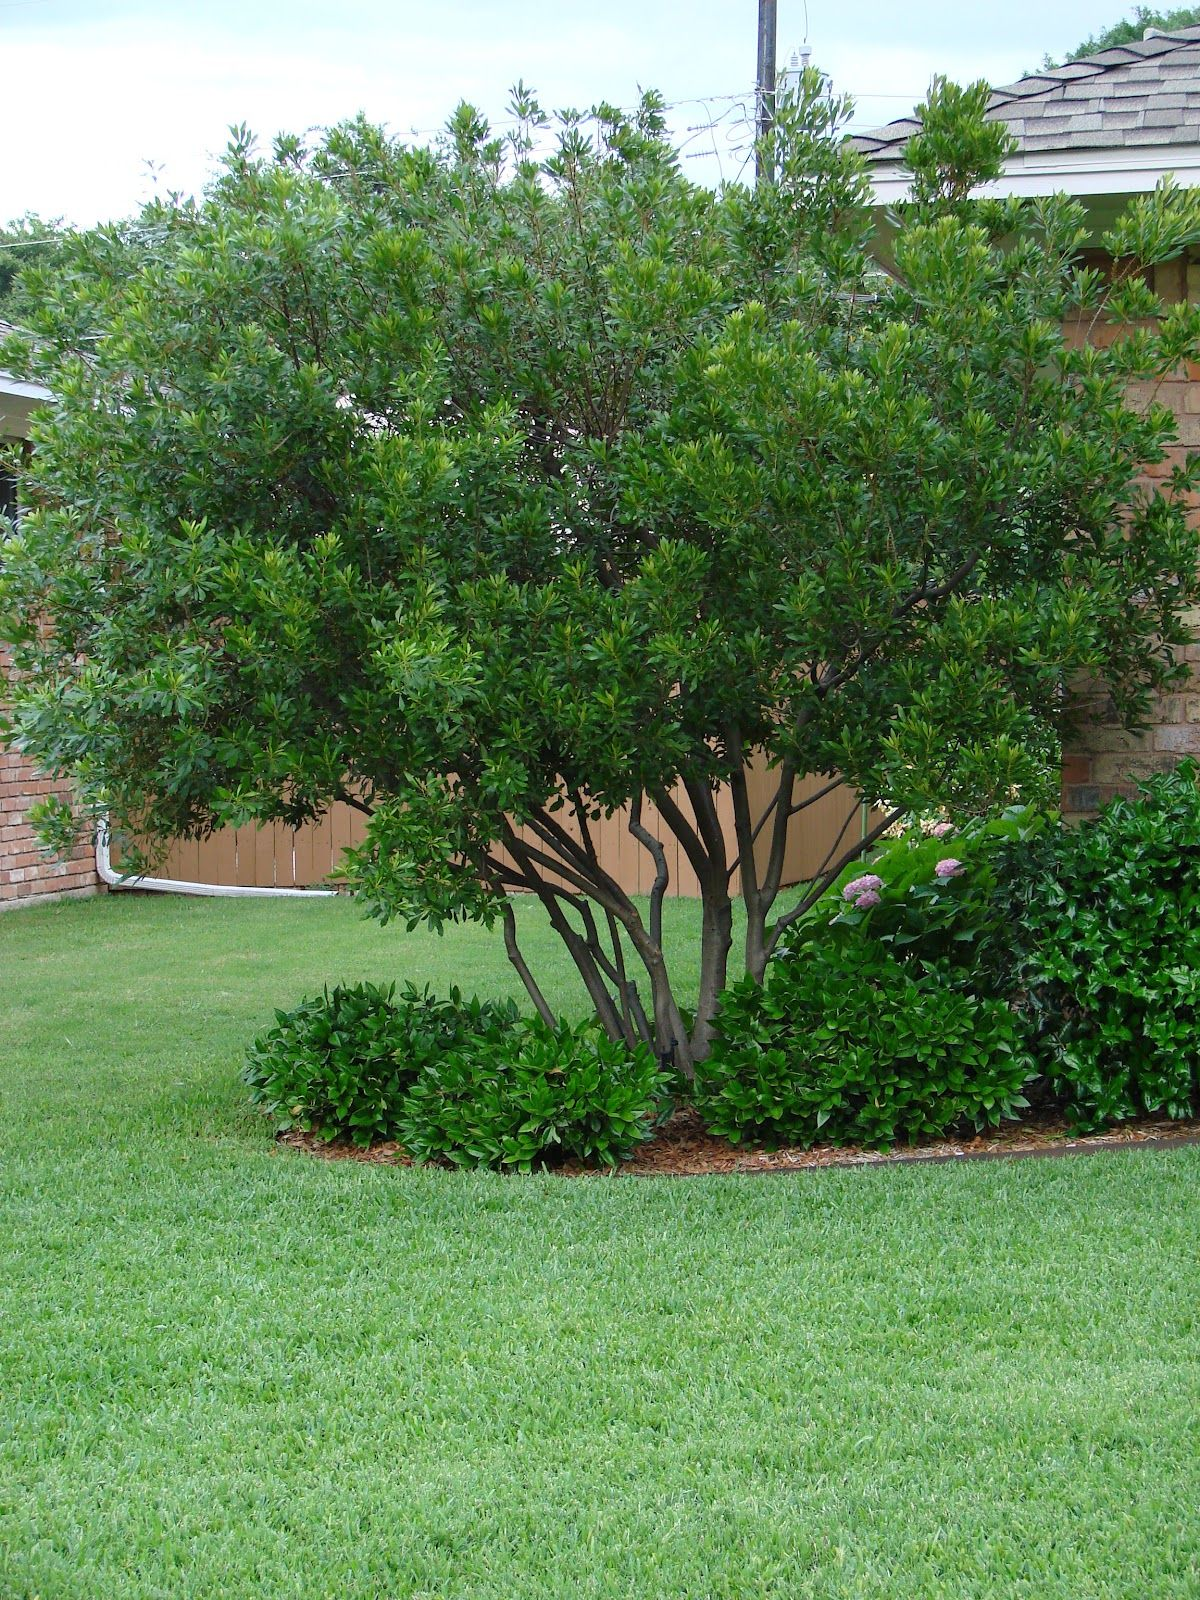 Garden landscape trees  wax myrtle treed  Garden  Pinterest  Myrtle tree Yard ideas and